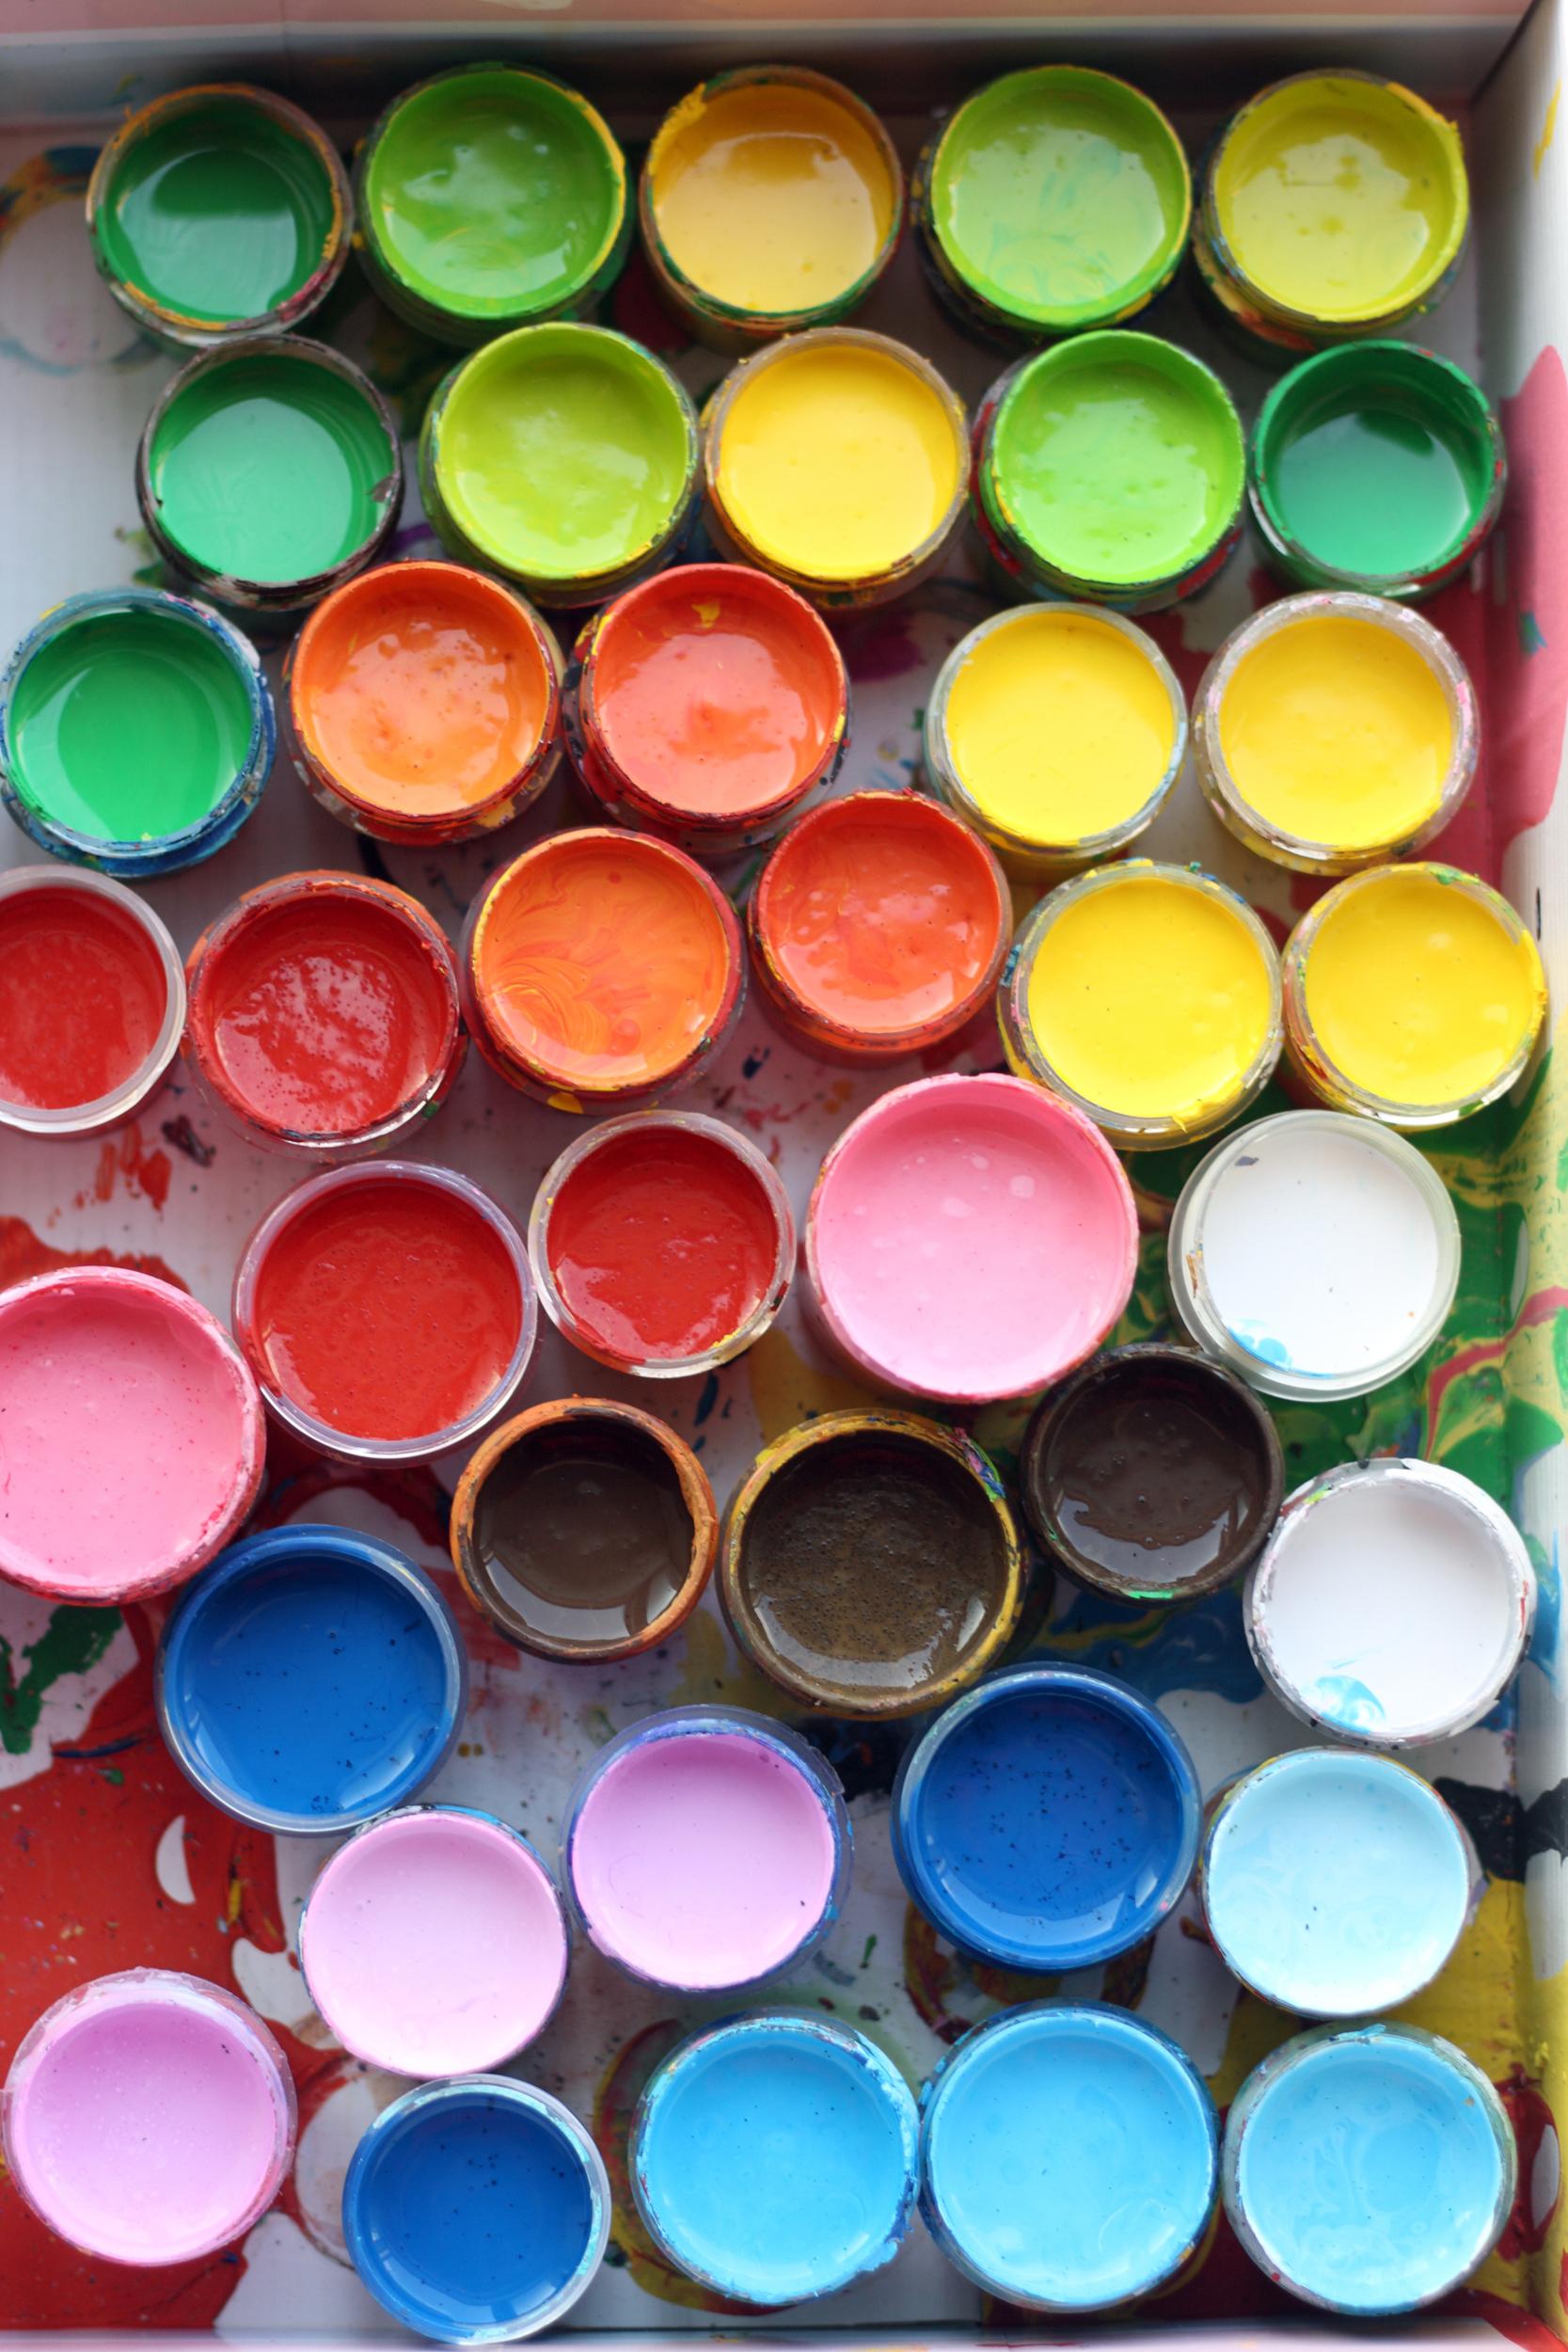 paint | body paint | beach | beach day | body paint for the beach | beach body paint | personality | express your personality